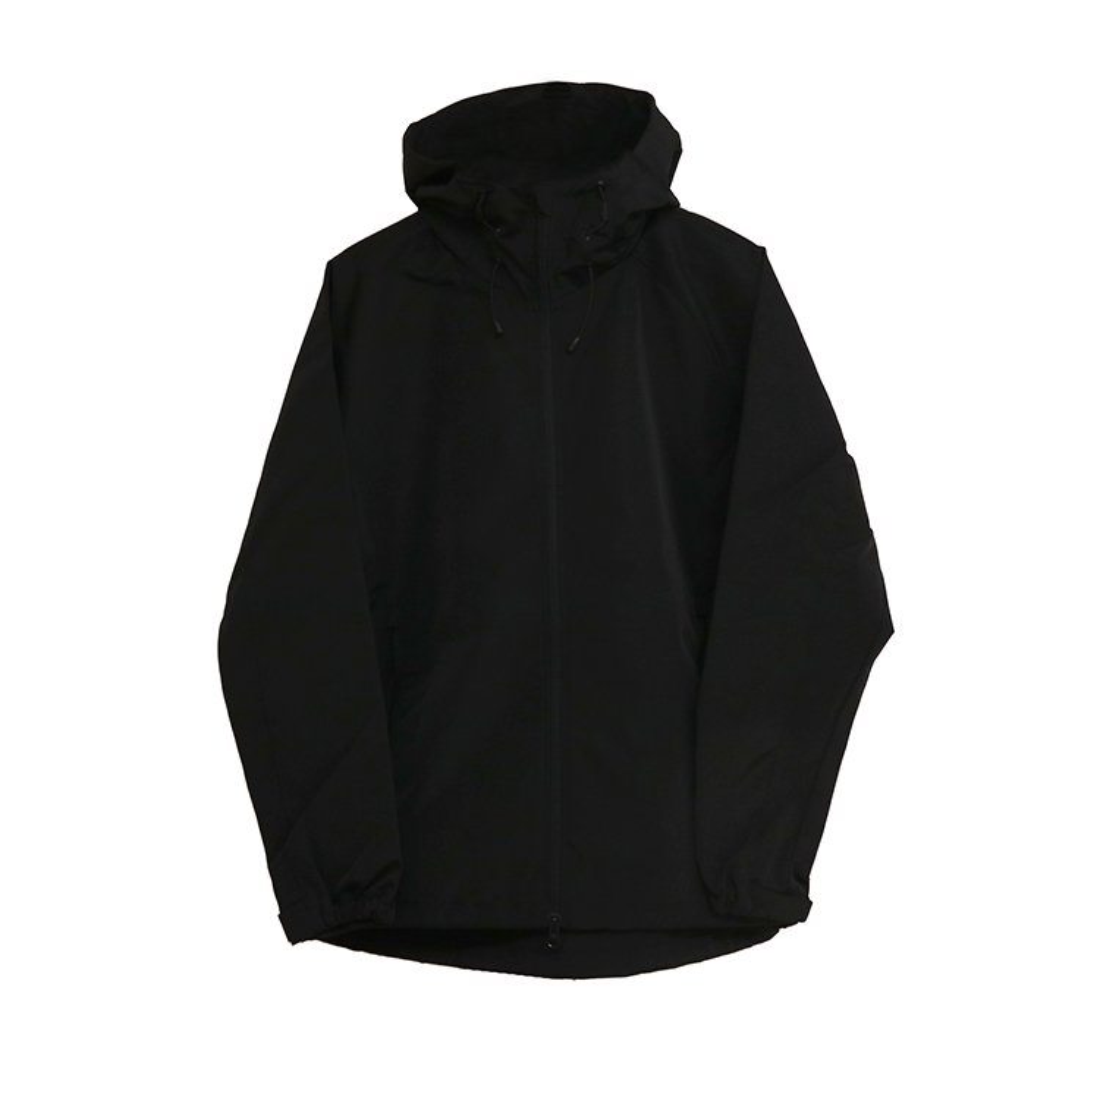 KLON SHELL PARKER BLACK